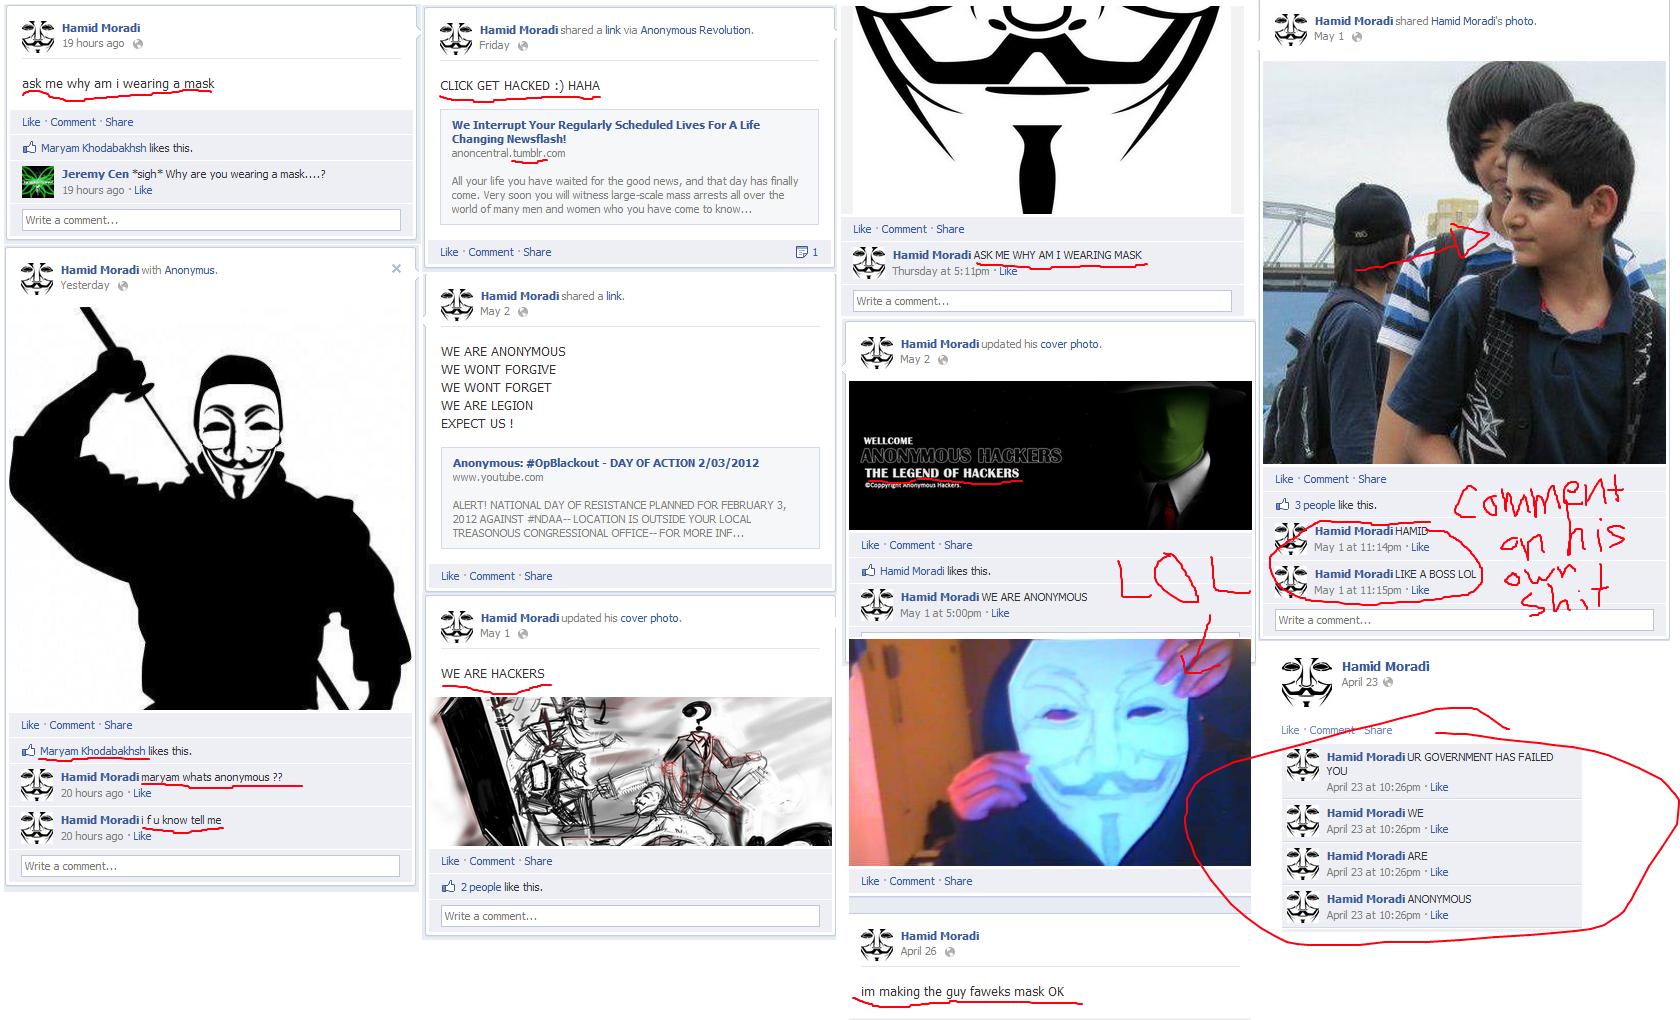 im an anonymous!!!!!1eleven. Make way for Mr. Badass. Iii. Hamid Mirada E Hamid a link via Anonymous Revolution, tijd, Fl-: ',?' Hamid Mirada' s phat). w 19 hou